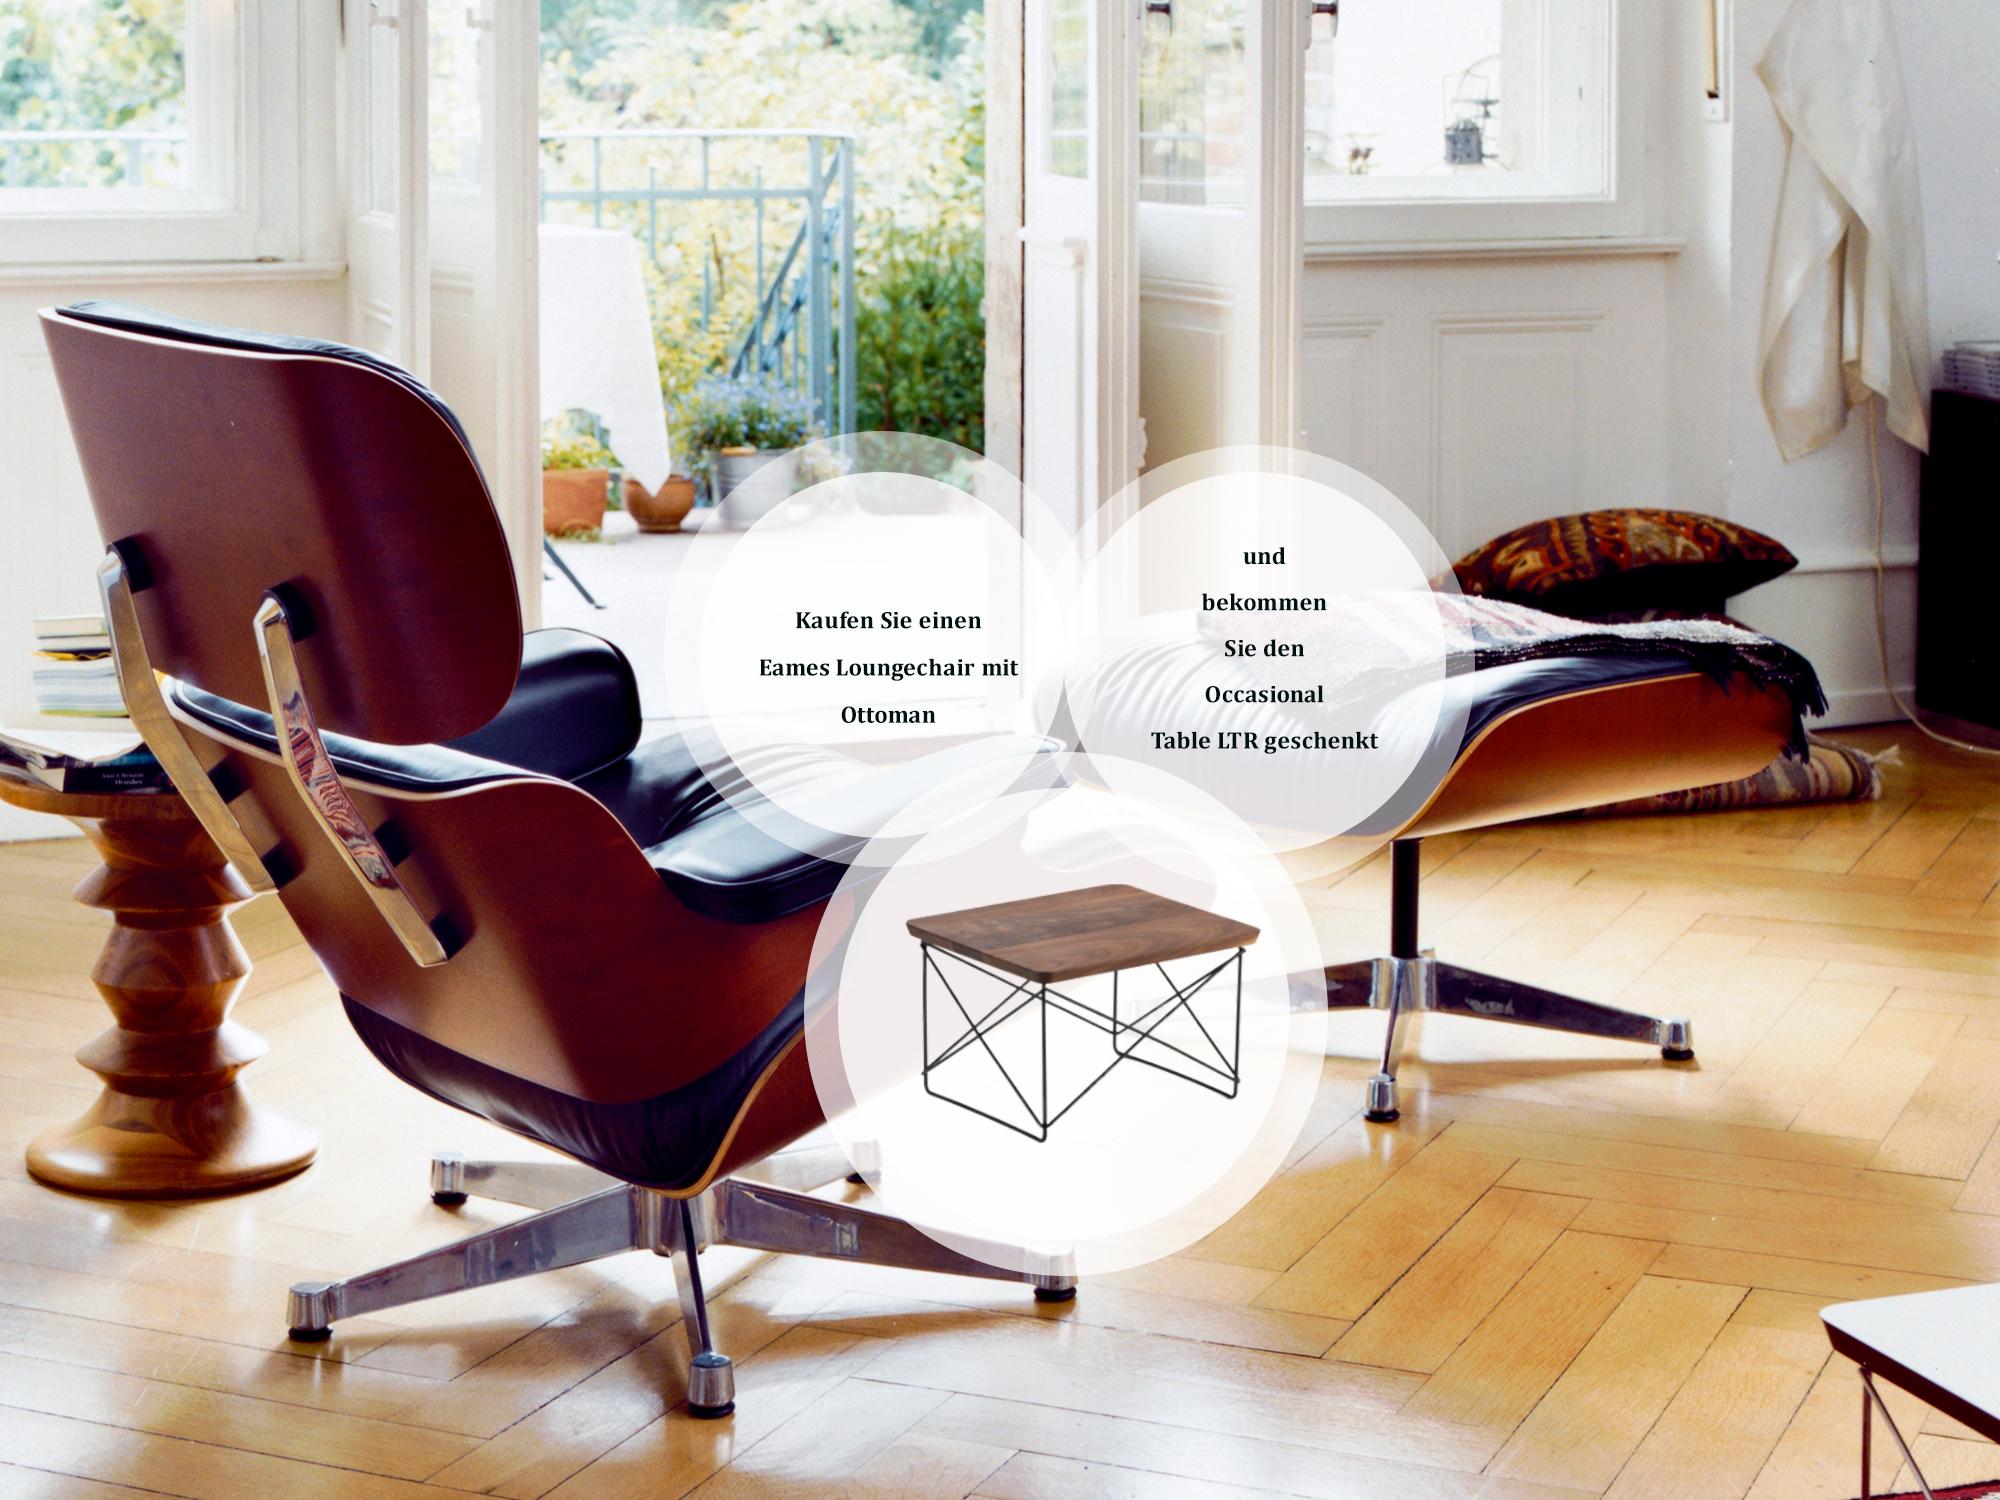 winteraktion-lounge-chair-meiser-living-2018